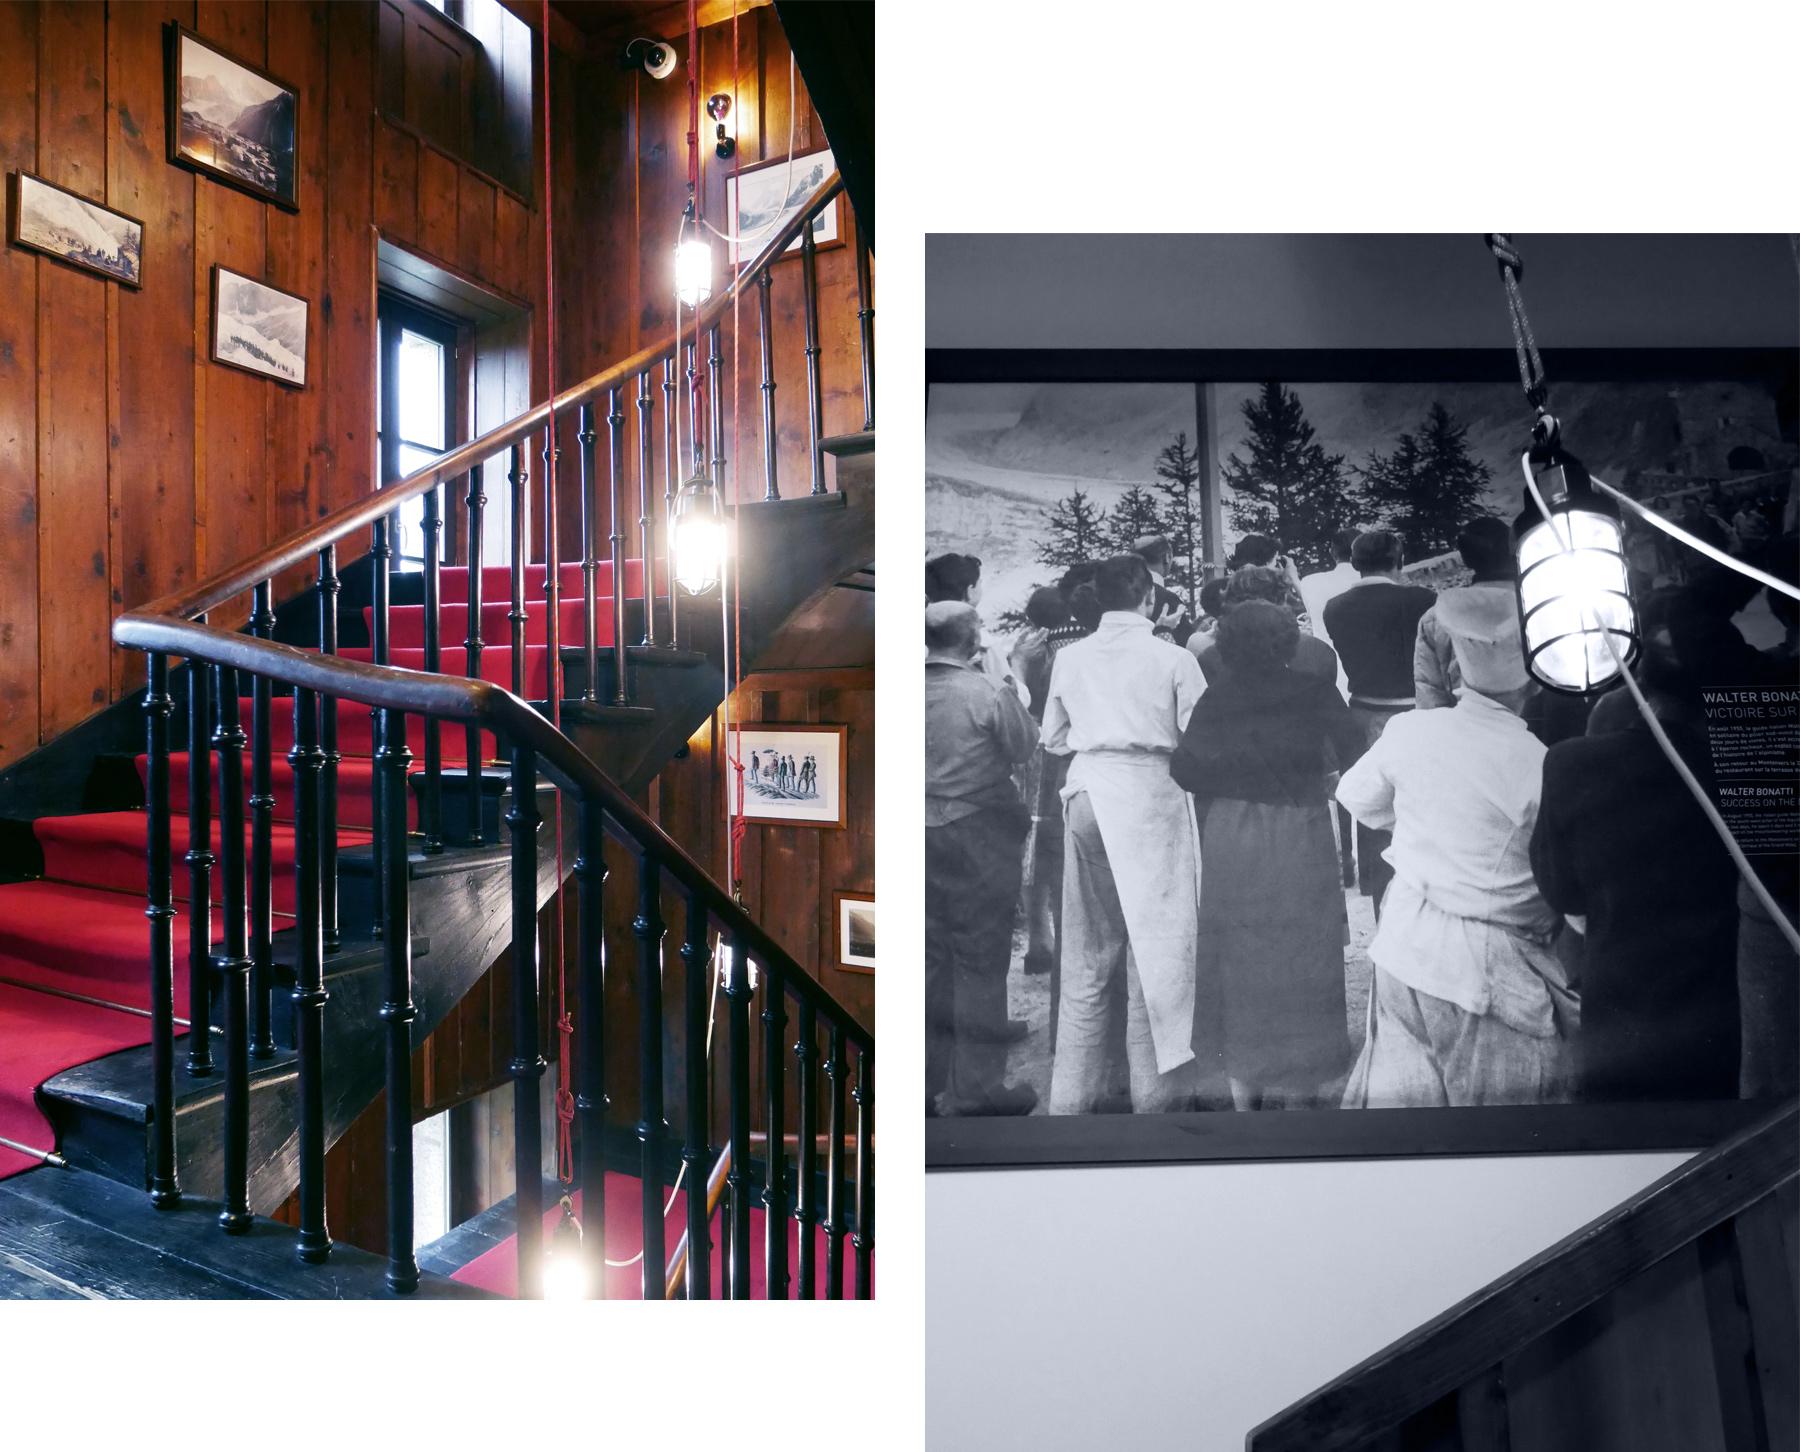 escalier refuge du montenvers